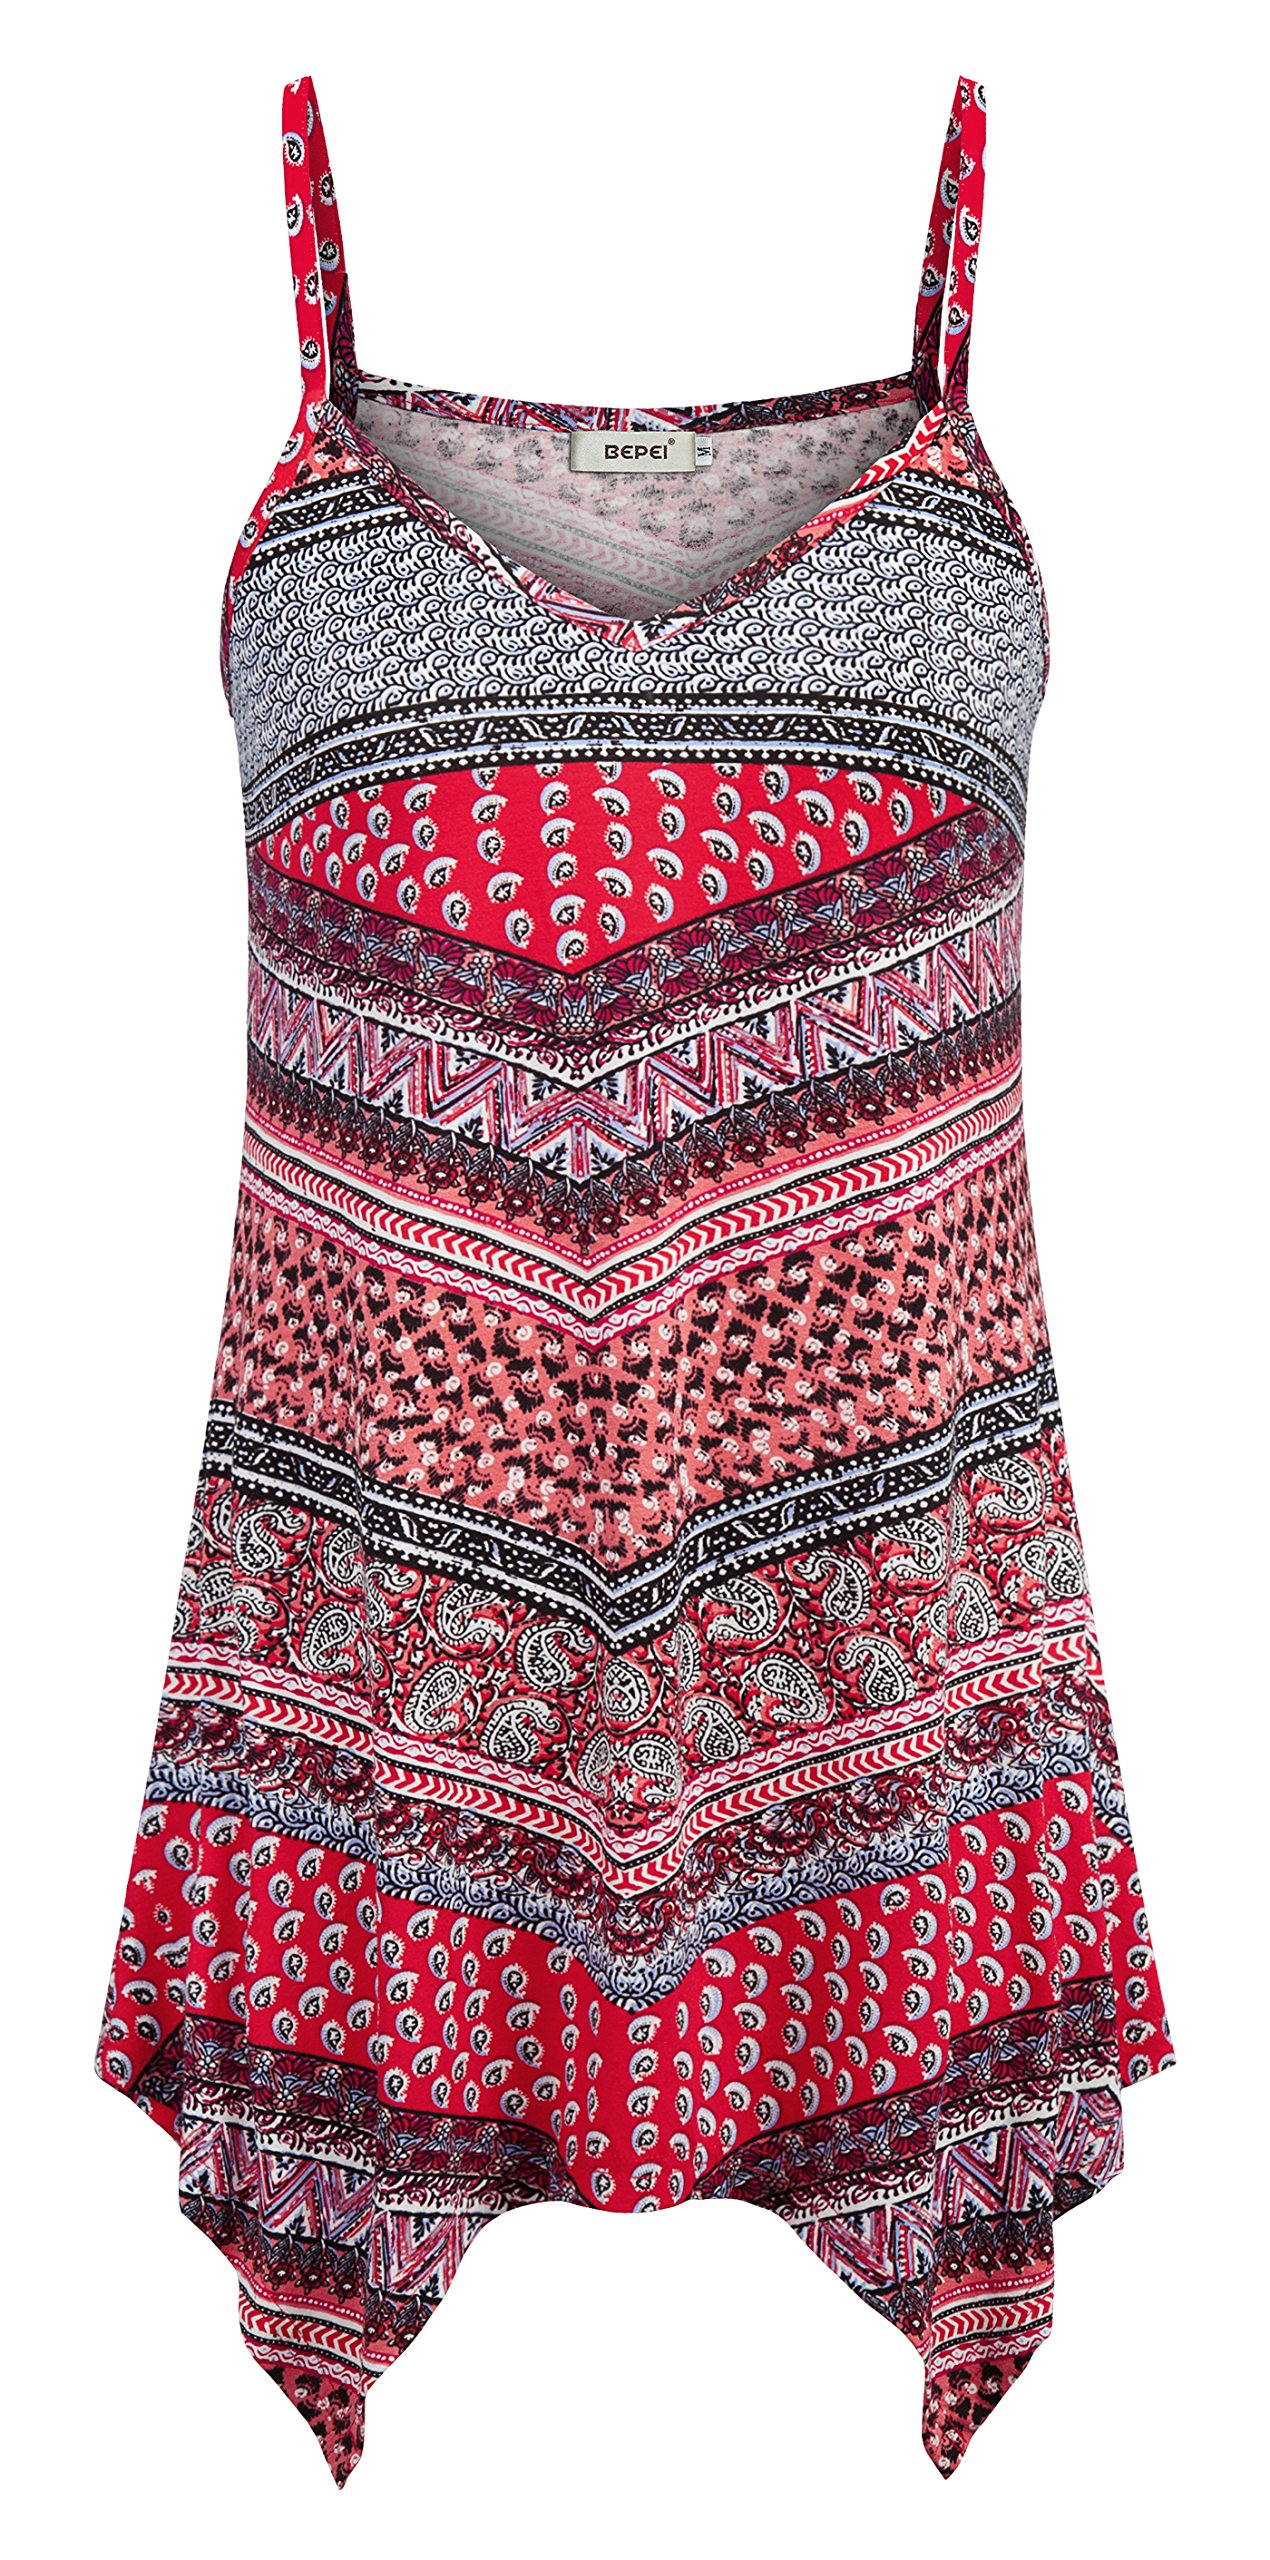 476a98be3b7 BEPEI Sleeveless Floral Shirts for Women,Ladies Stylish Spaghetti Strap  Camisoles Tank Print Breezy Loose Botttom Ruffles Tunics Summer Basic V  Neck Tops ...